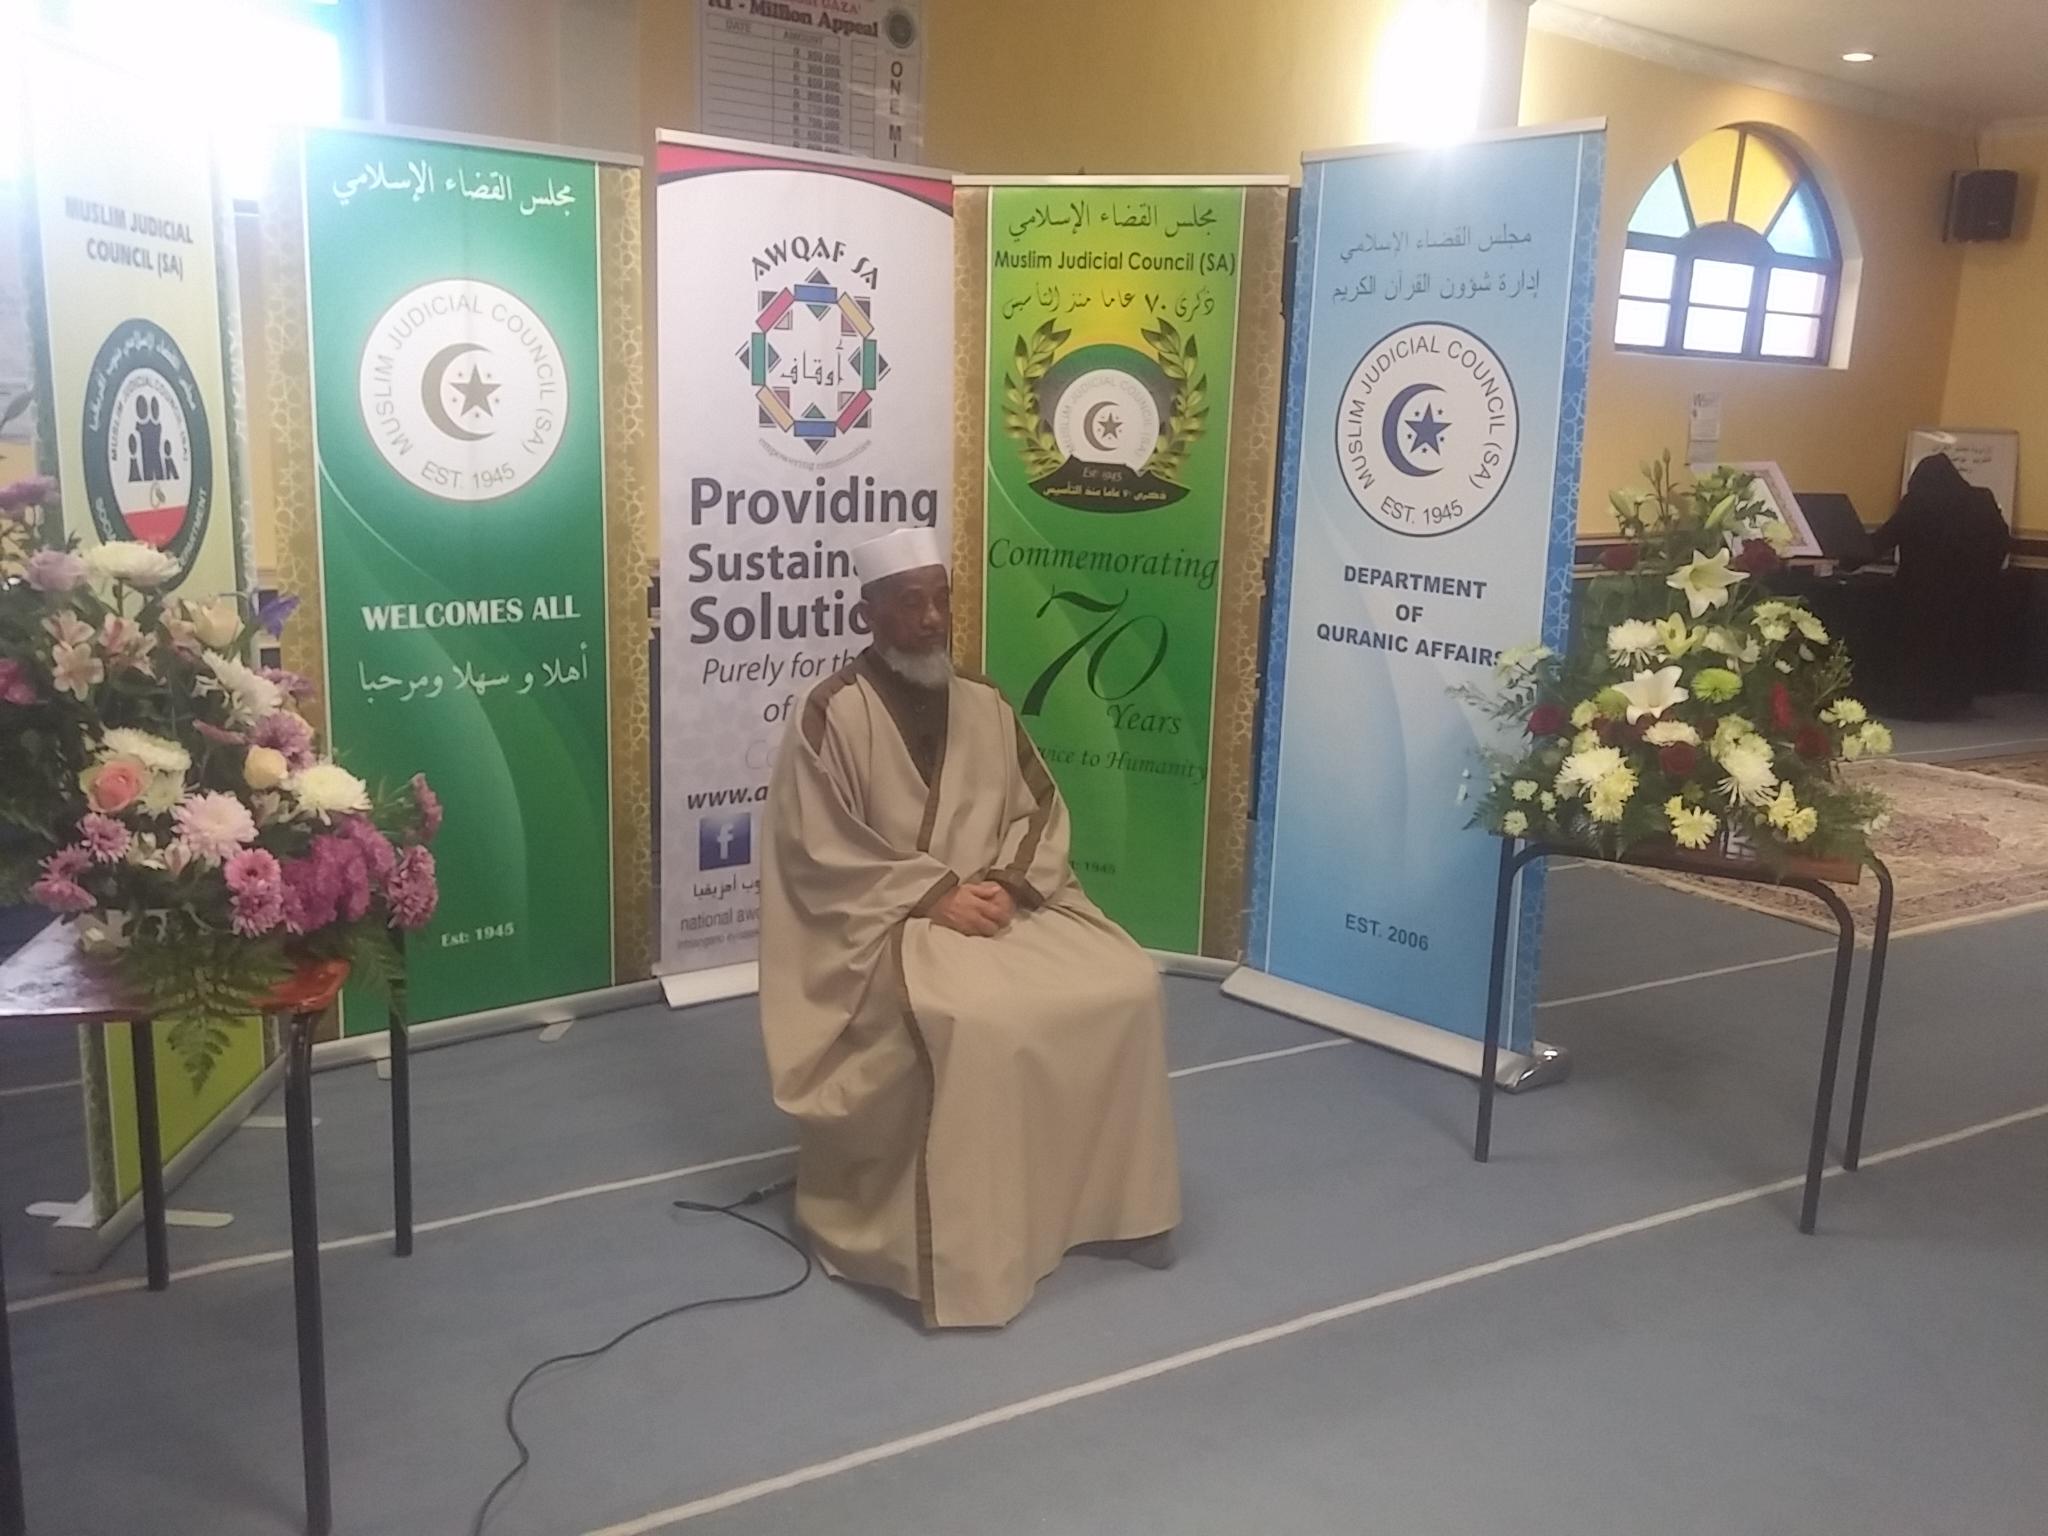 - 20160619 1354301 - MJC Hosts Khatmul Quran Program in Honorof our Illustrious Leaders